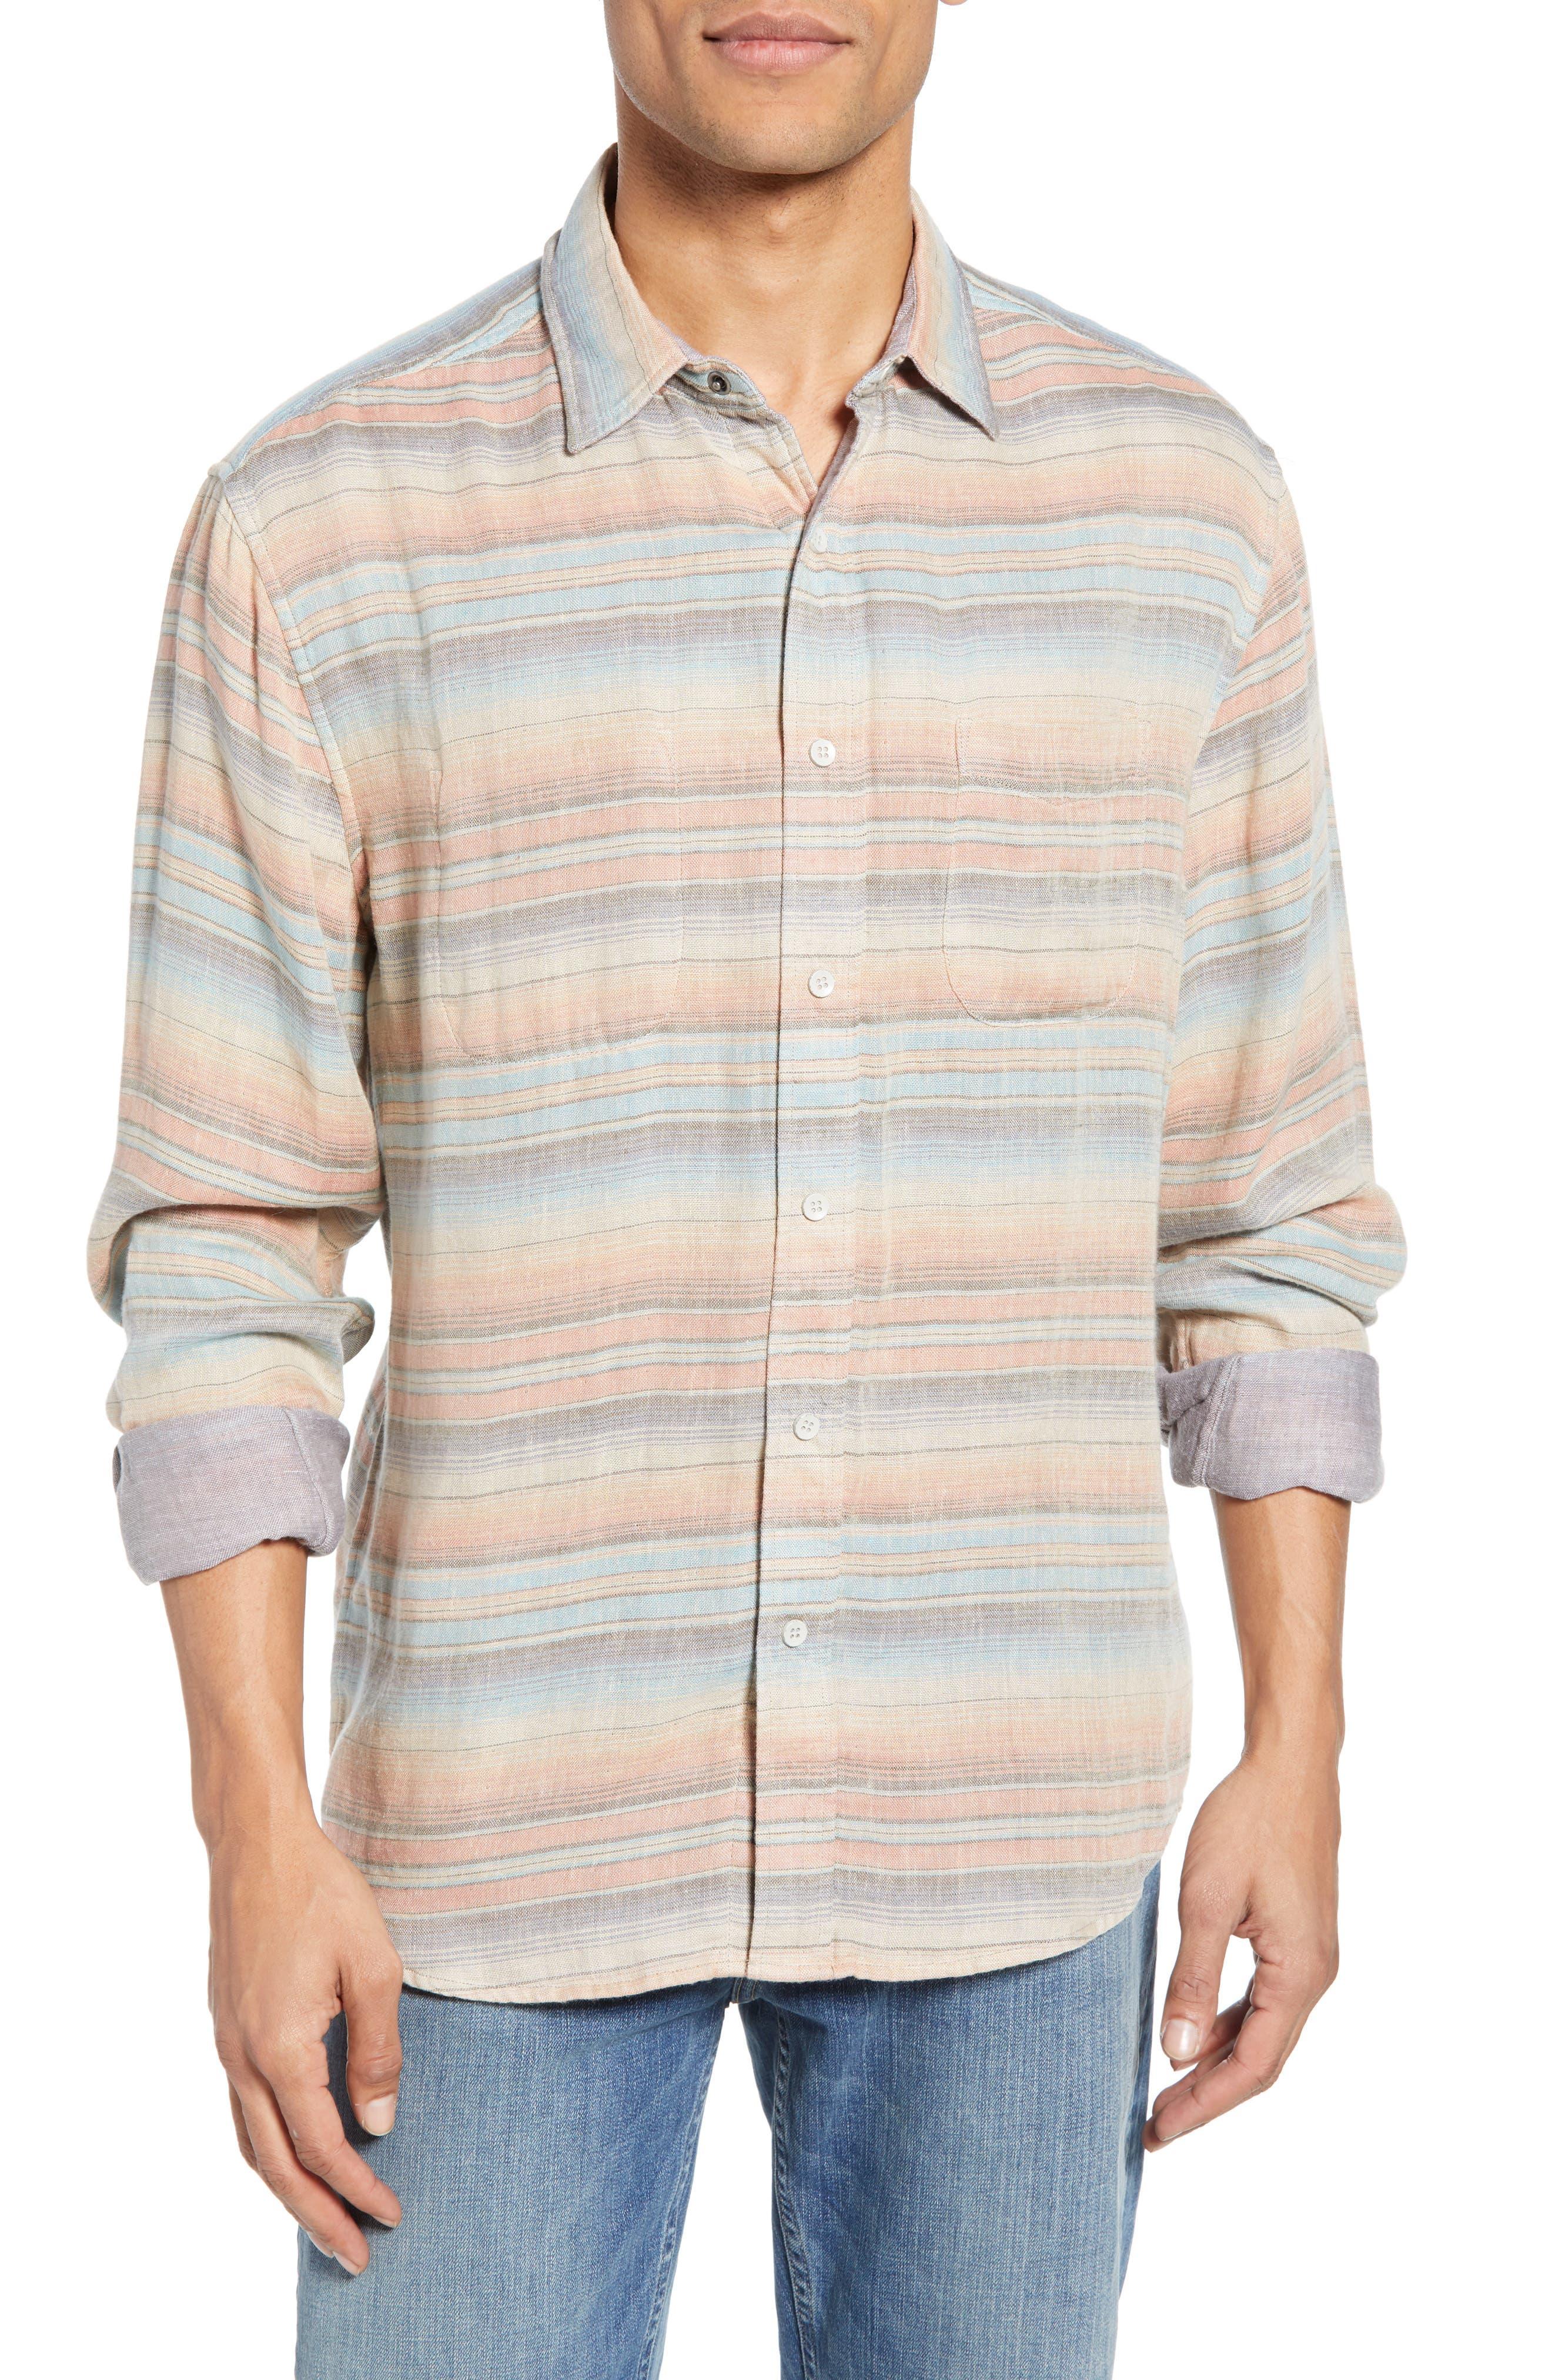 Belmar Regular Fit Reversible Shirt, Main, color, EVENING PLAYA